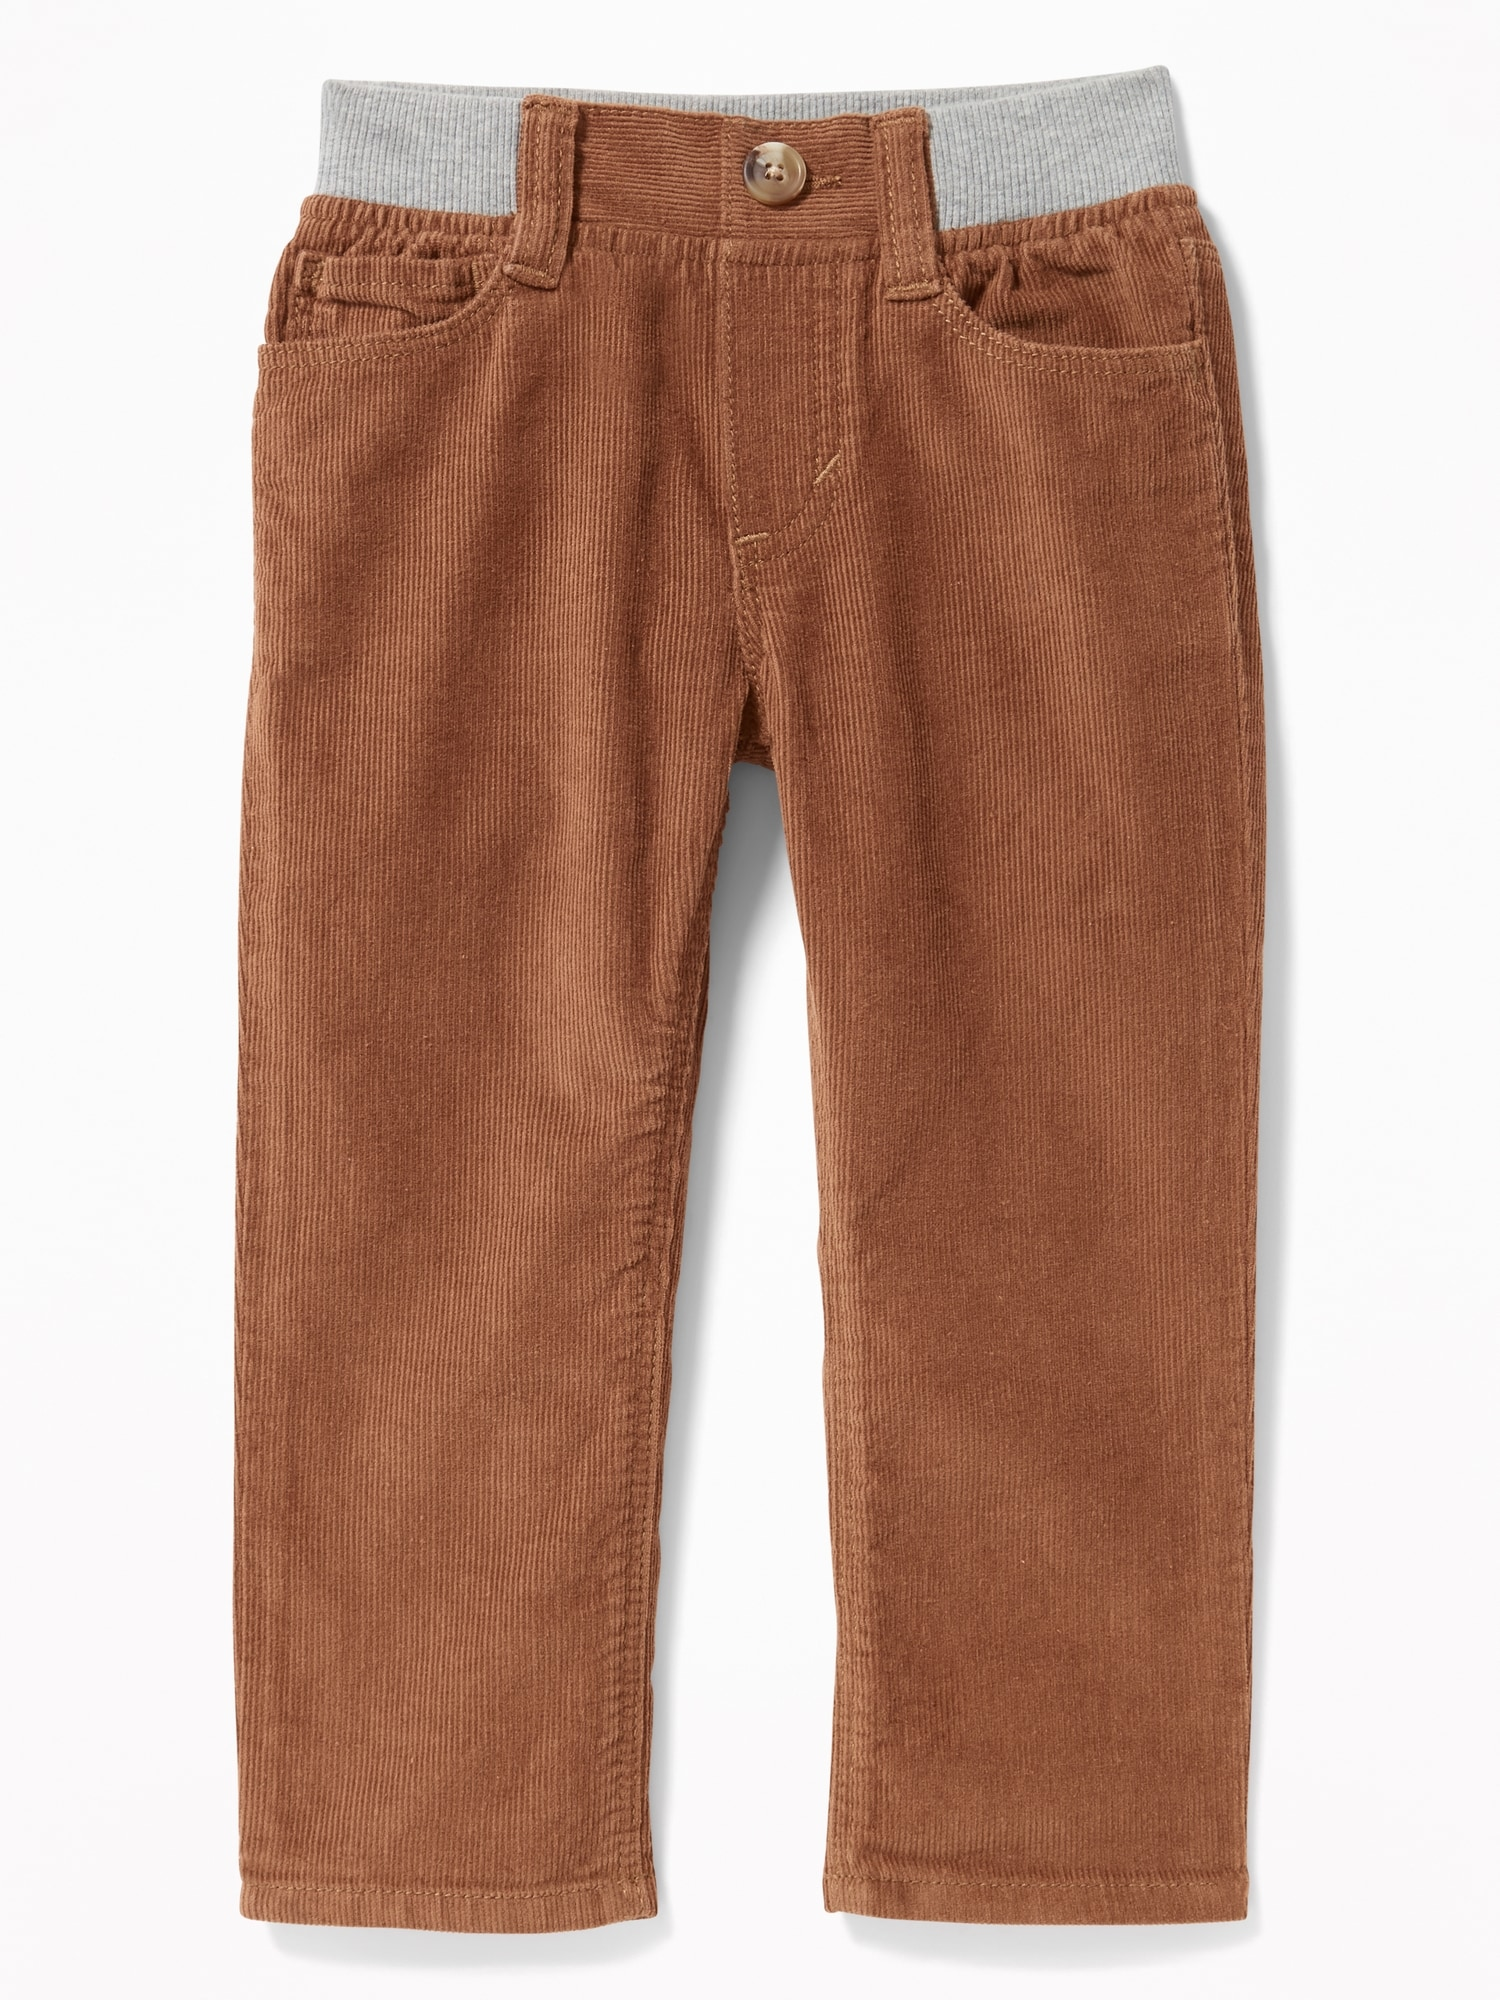 9554300b7 Rib-Waist Pull-On Skinny Cords for Toddler Boys | Old Navy